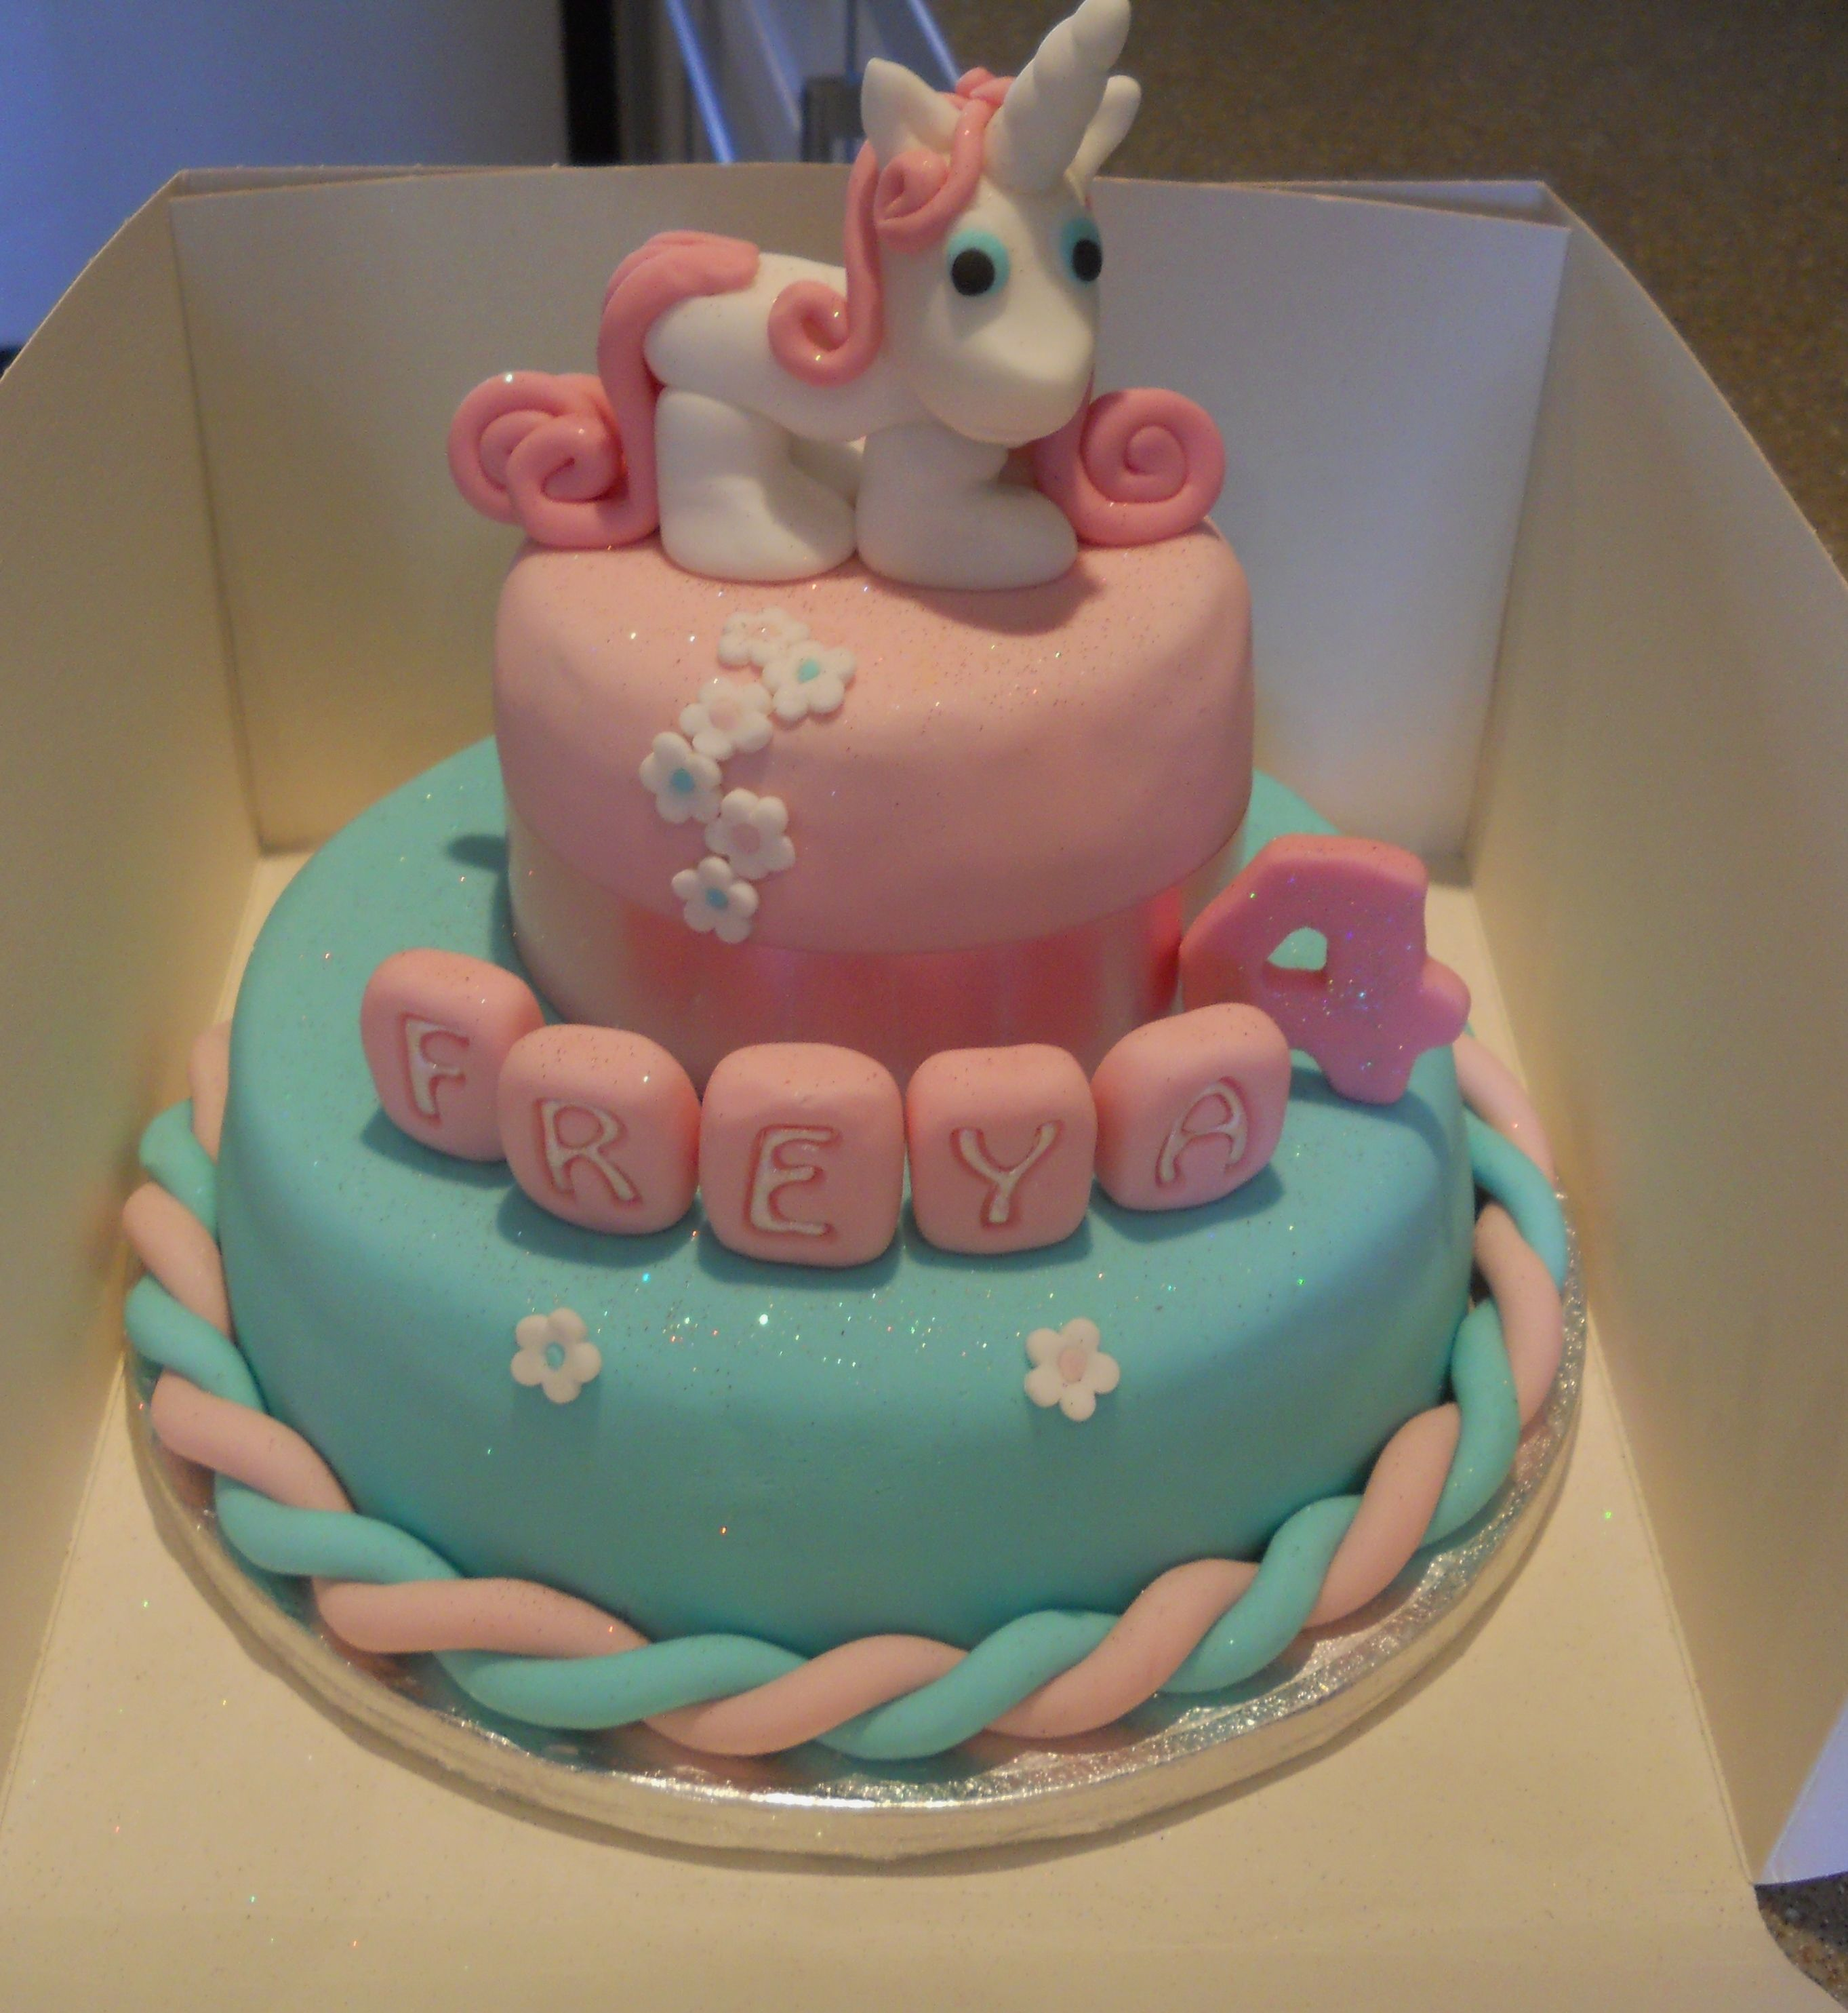 unicorn cake Little girls unicorn cake thx 4 looking Party